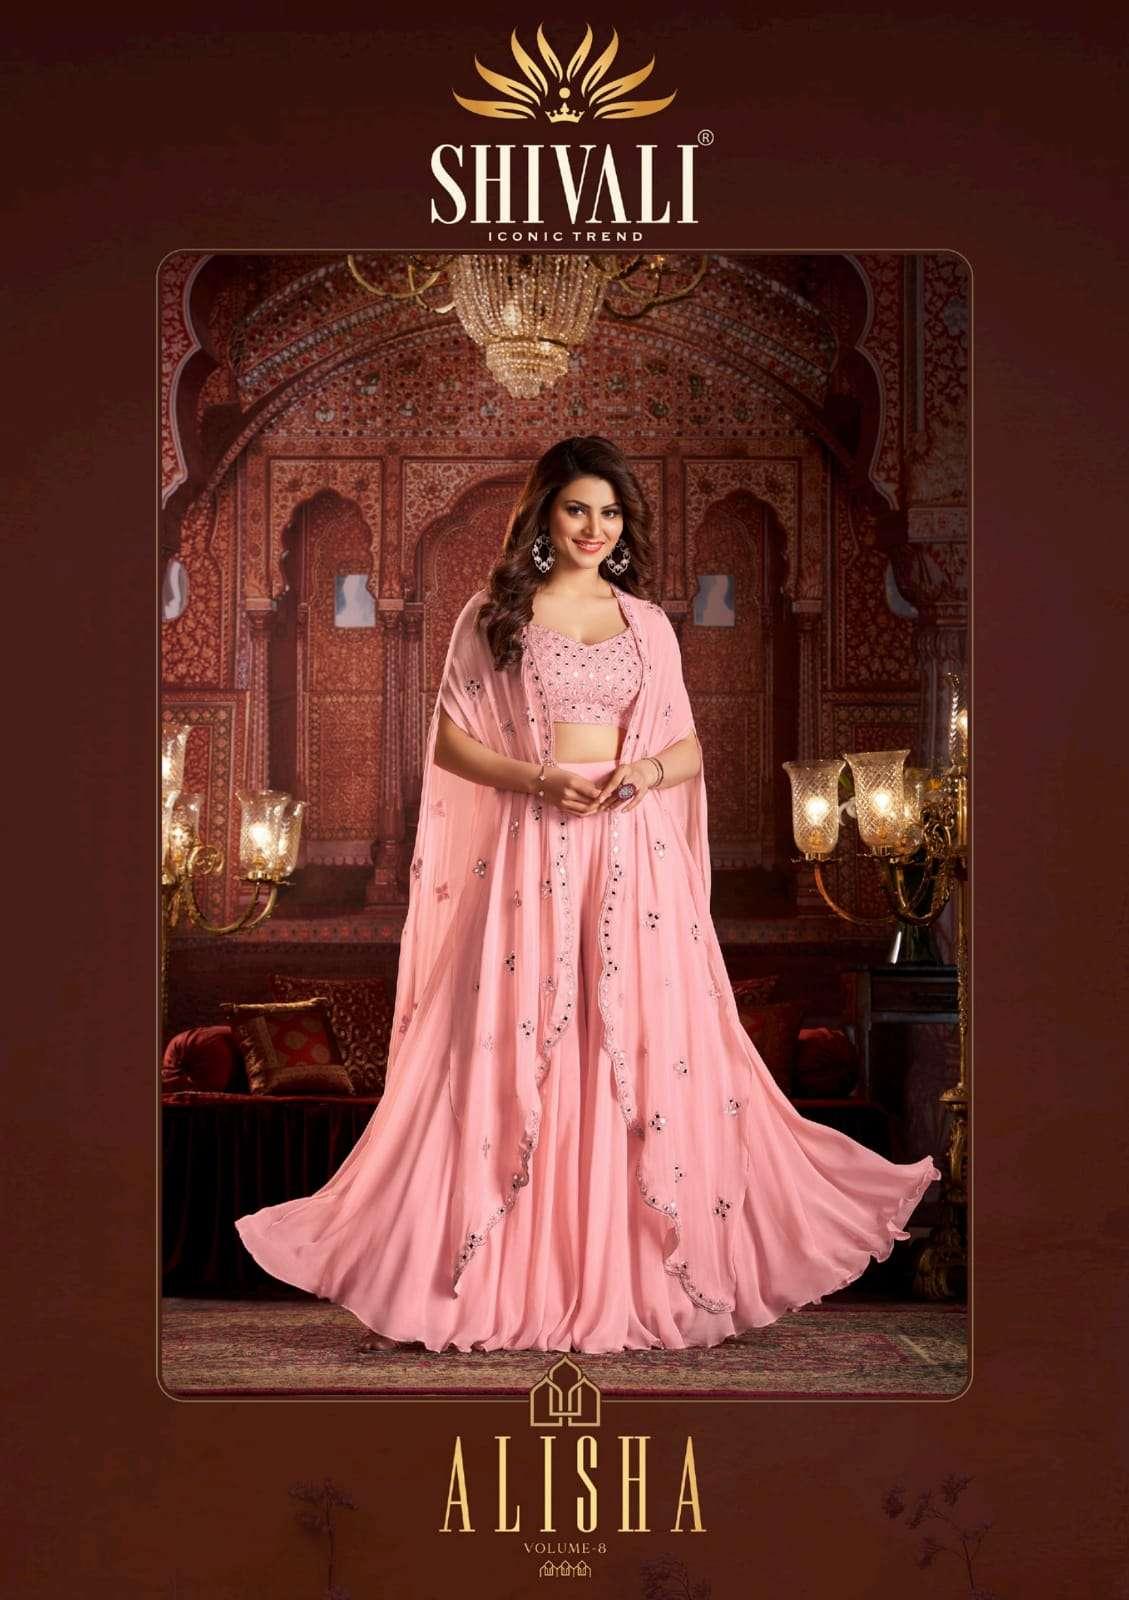 Shivali Alisha Vol 8 Designer 3 Piece Party Wear Collection